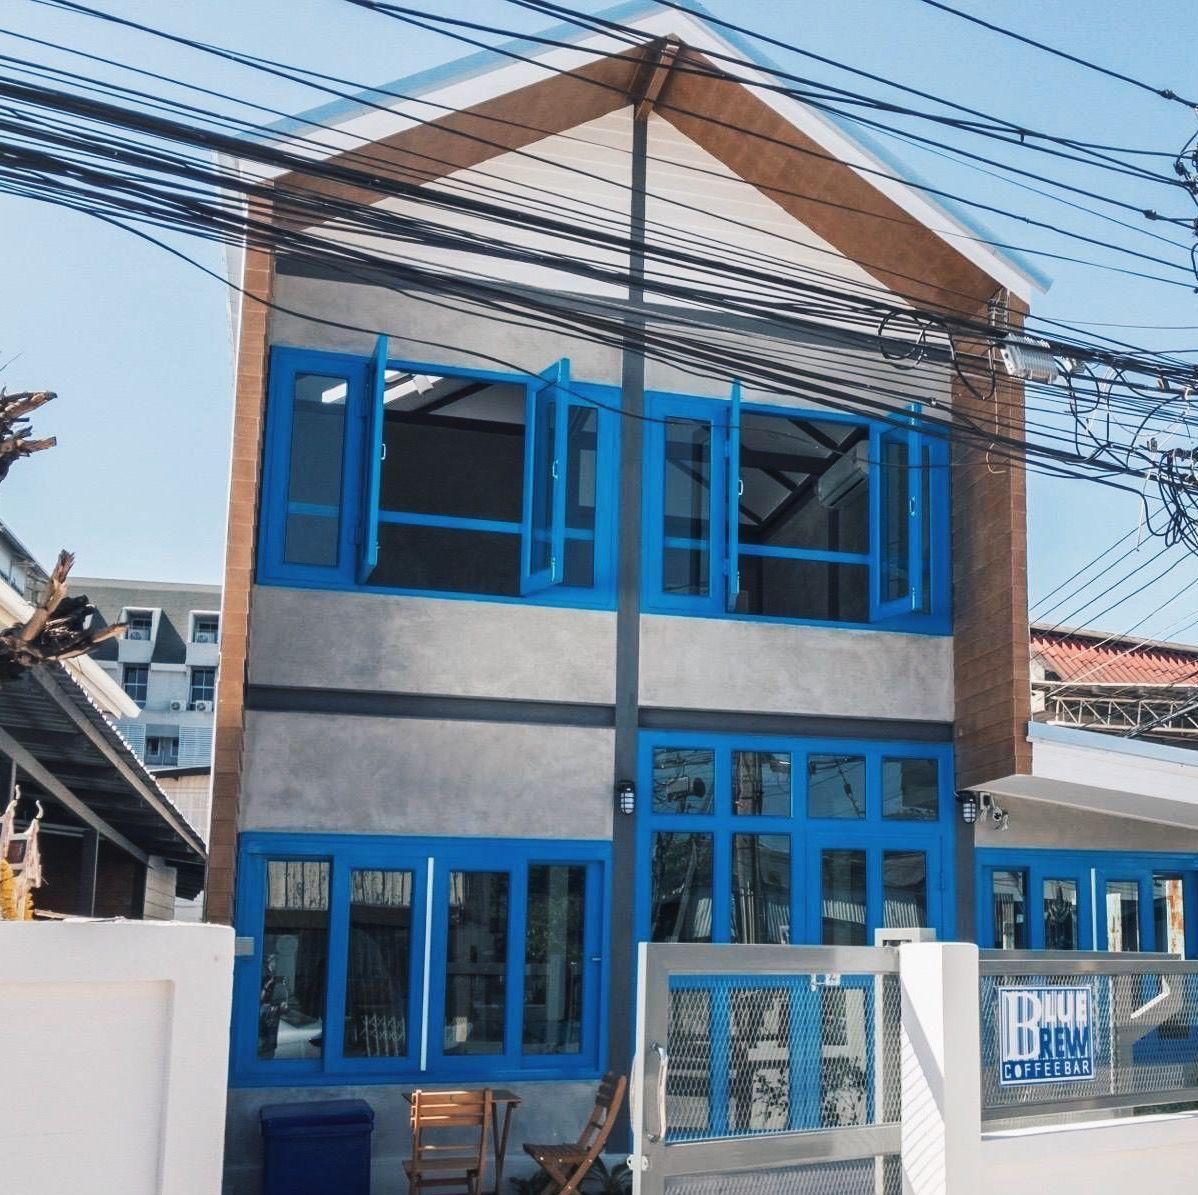 "Wongnai na Twitteru: ""คาเฟ่สีฟ้าเล็กๆ น่ารักแห่งเมืองโคราช  ใครชอบสีฟ้าต้องชอบร้านนี้แน่นอนน! 😍 แถมไม่ต้องหวั่นเรื่องที่จอด!  เพราะร้านเขามีที่จอดรถให้เหลือเฟือ! 📍Blue Brew Coffee Bar : ซ.เสาธง1  นครราชสีมา 📷นักรีวิววงใน #วงในพาแดก… https://t.co ..."